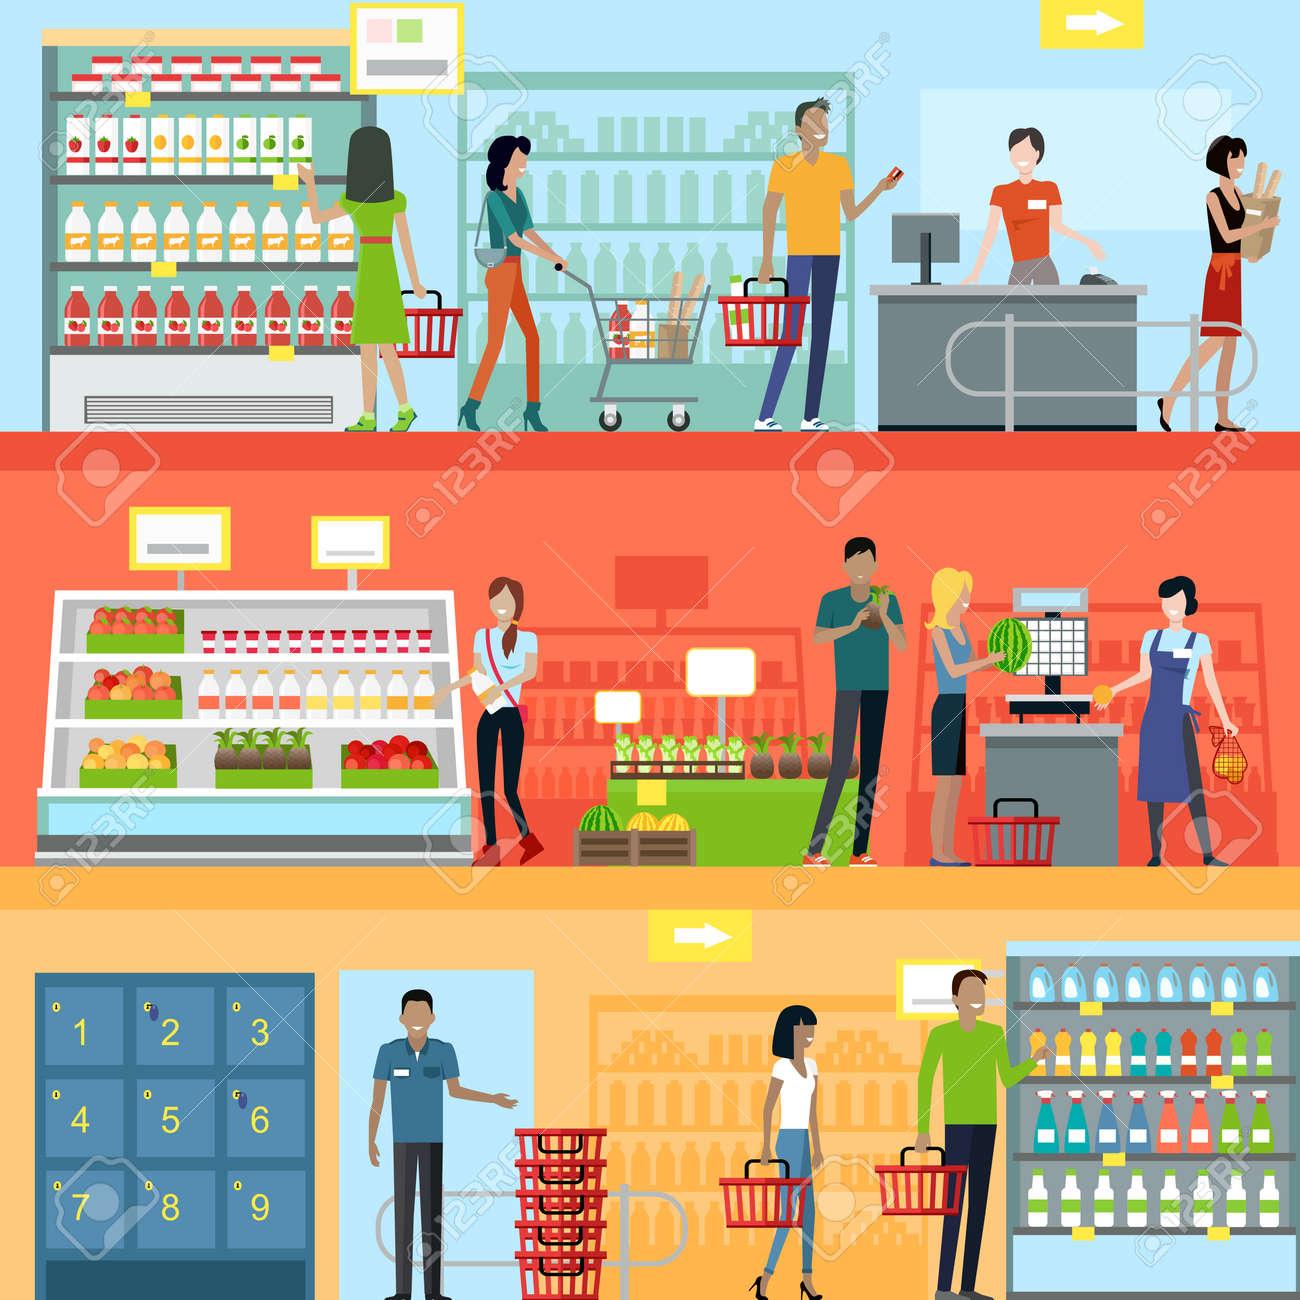 People in supermarket interior design. People shopping, supermarket shopping, marketing people, market shop interior, customer in mall, retail store illustration Foto de archivo - 50439652